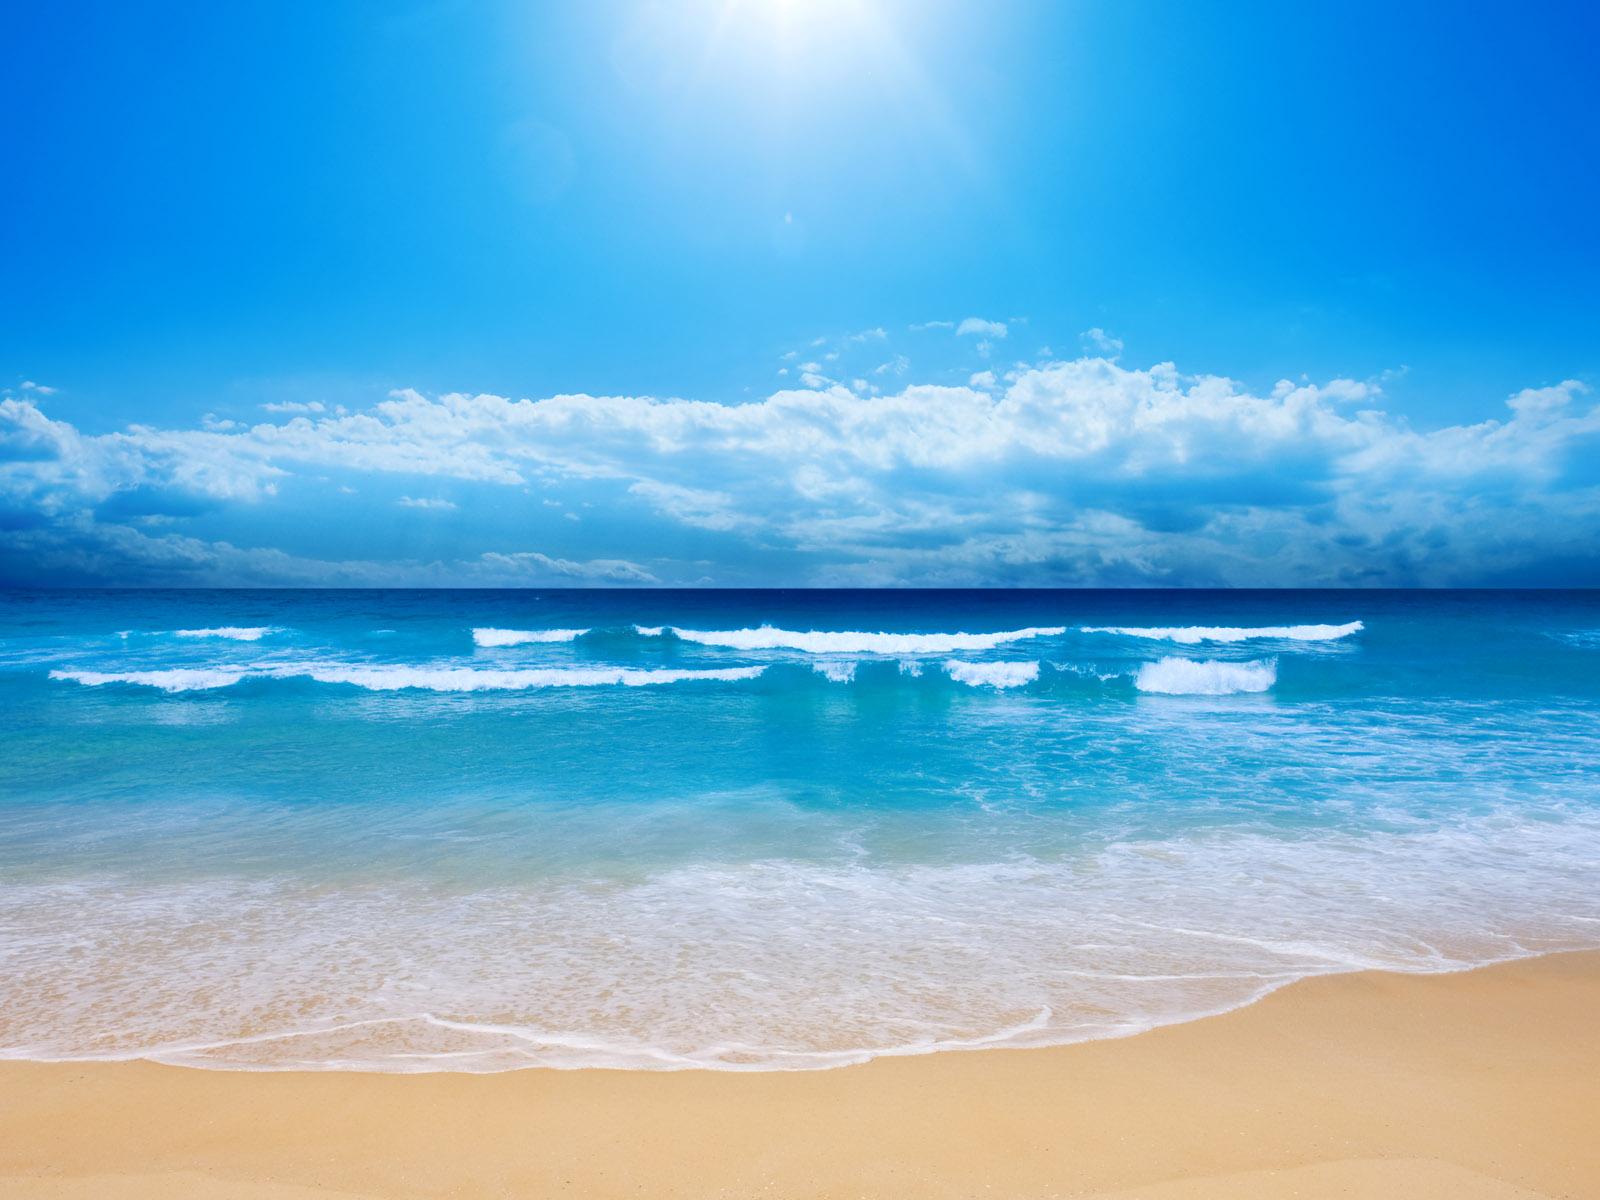 1317 Beach HD Wallpapers Backgrounds 1600x1200